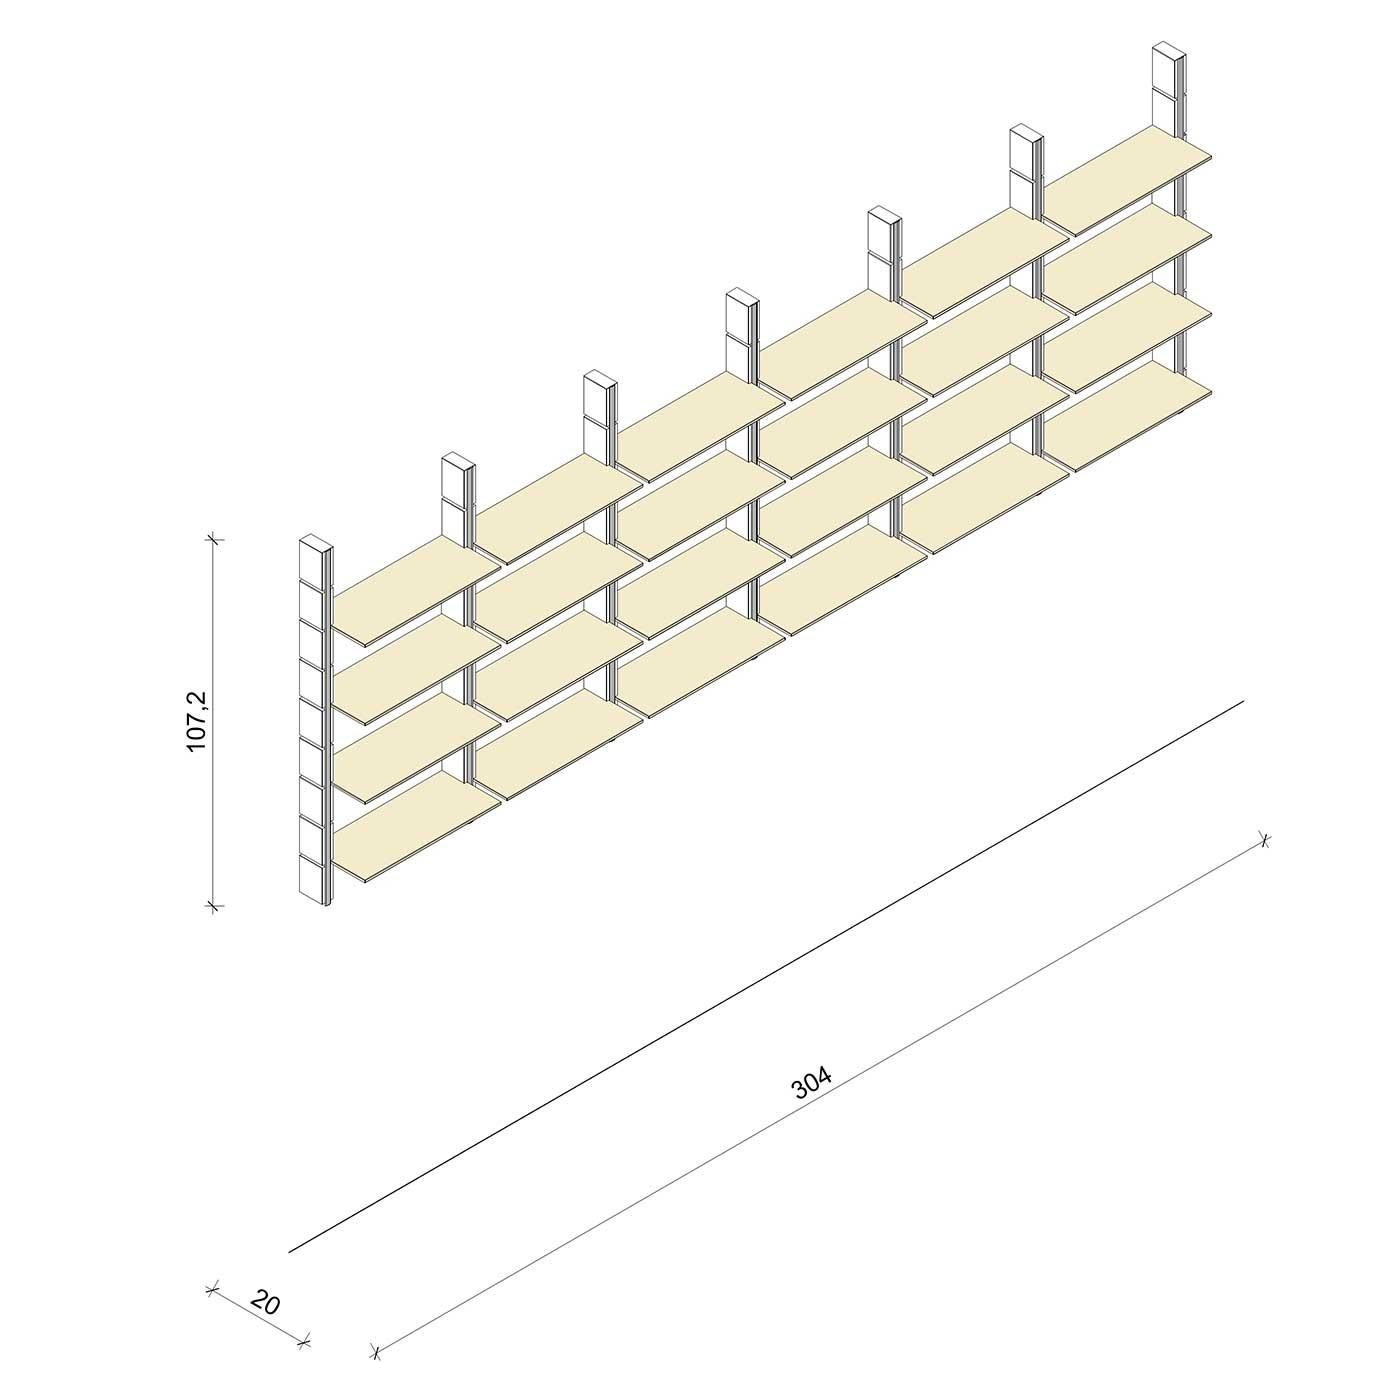 Bücherregal - Basic (M) 304 - Maß: 304 x 107,2 x 20 cm (B x H x T)